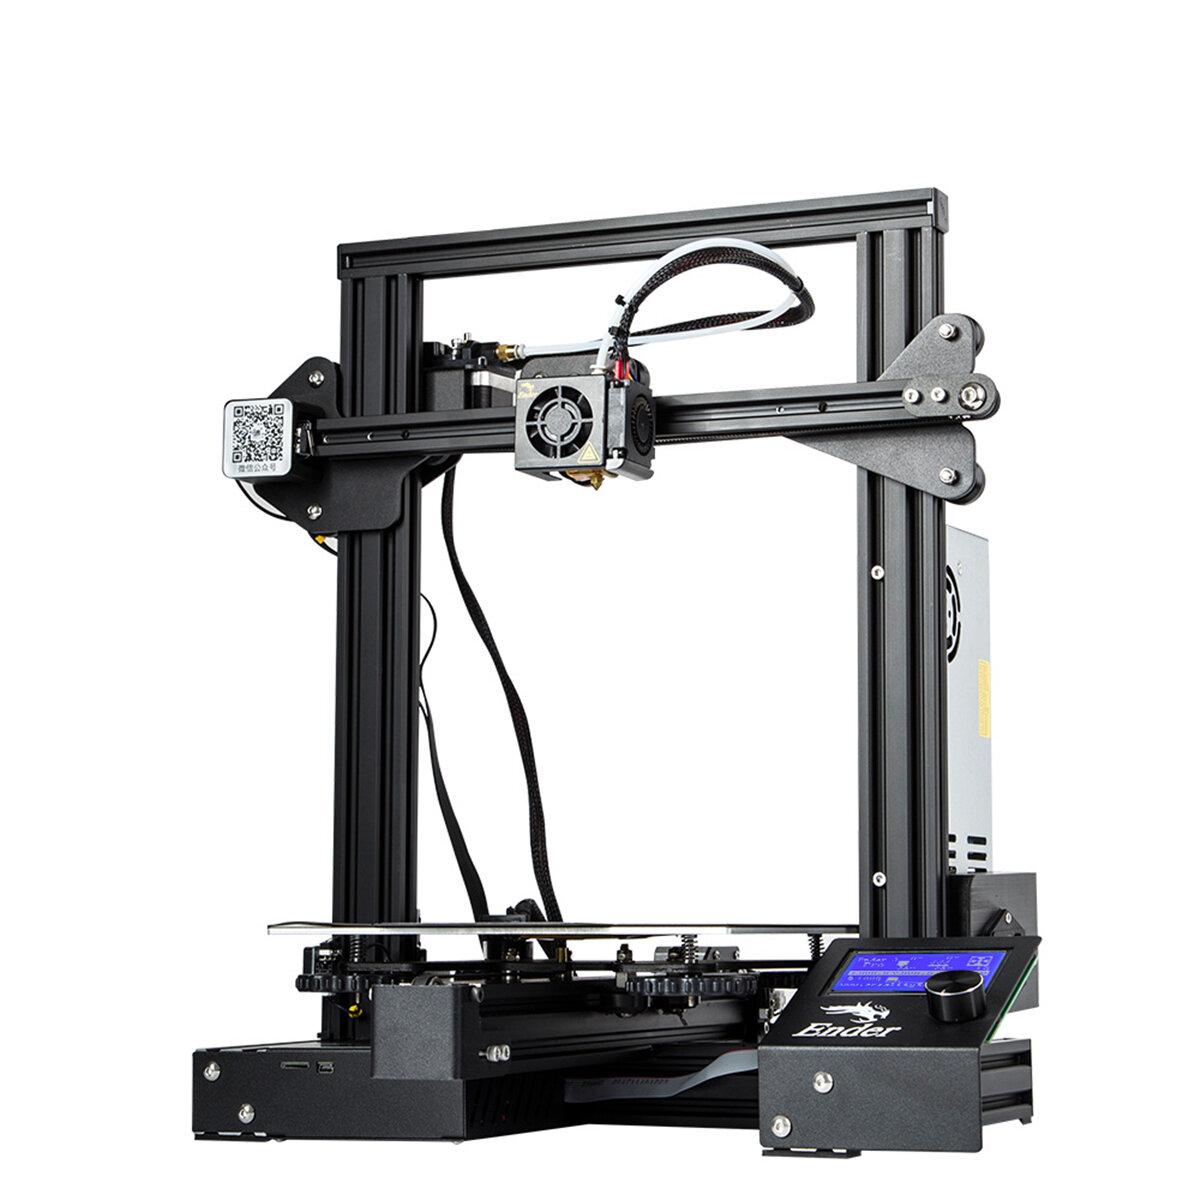 Creality 3D® Ender-3 Pro V-slot Prusa I3 DIY 3D Printer 220x220x250mm Printing...